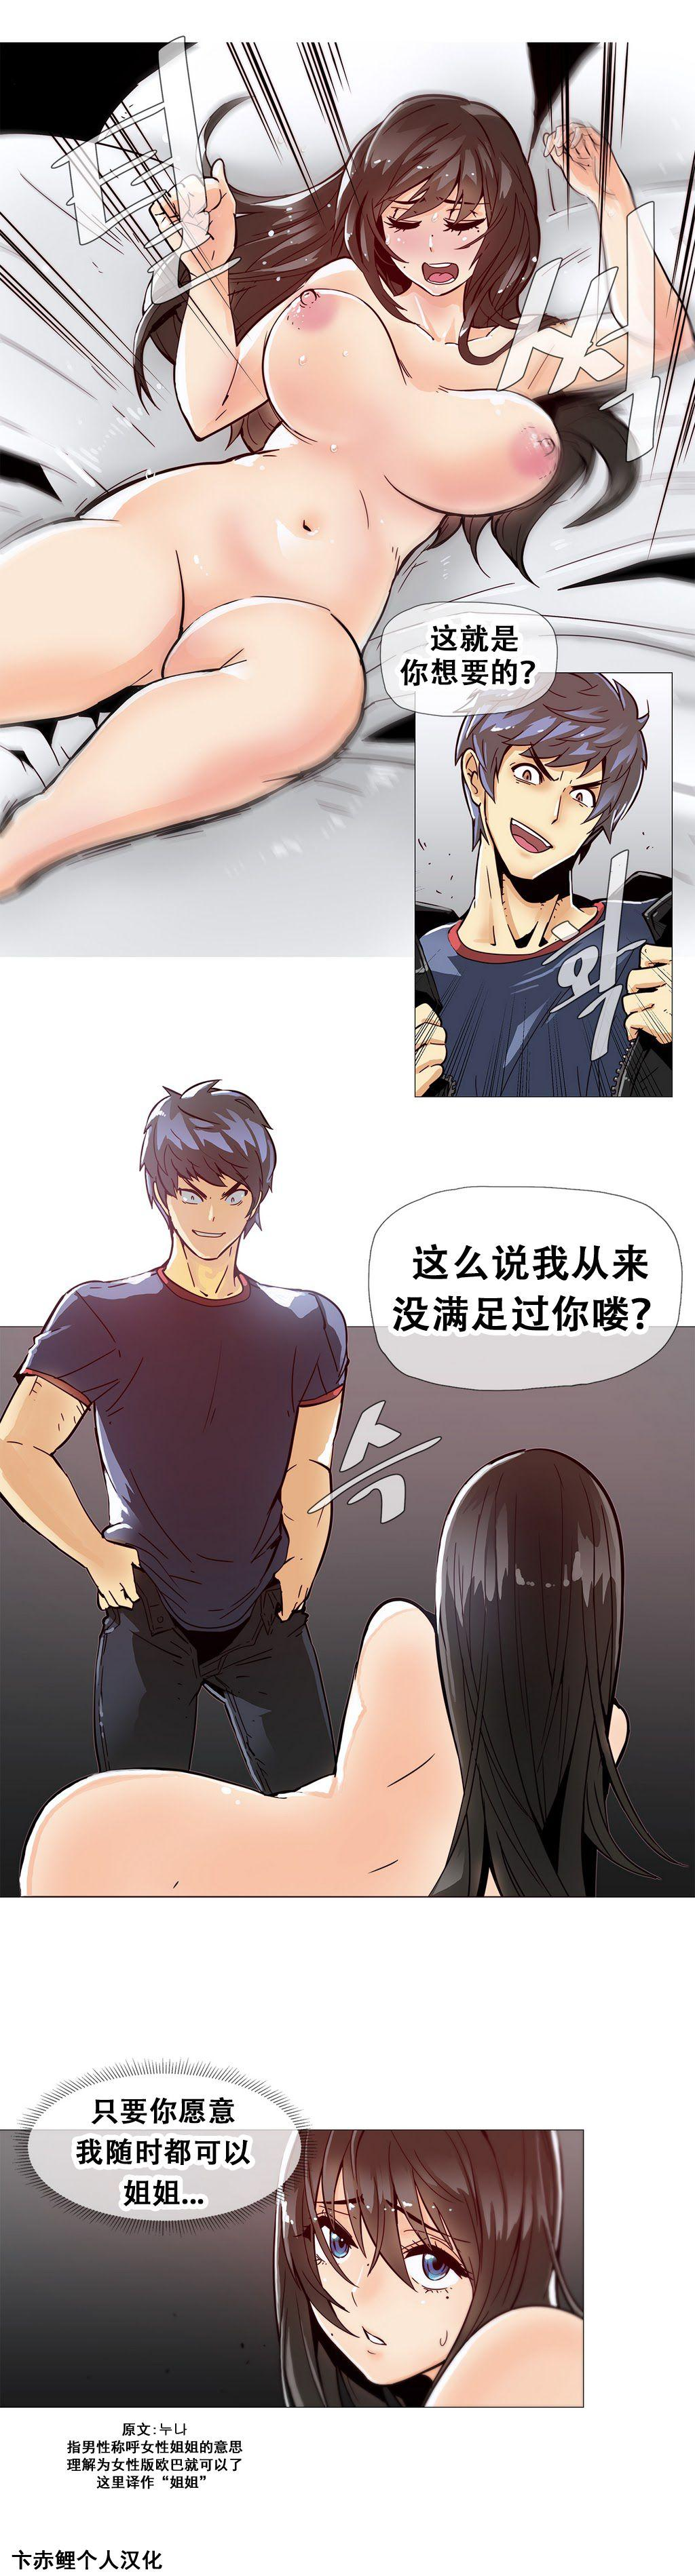 HouseHold Affairs 【卞赤鲤个人汉化】1~33话(持续更新中) 247